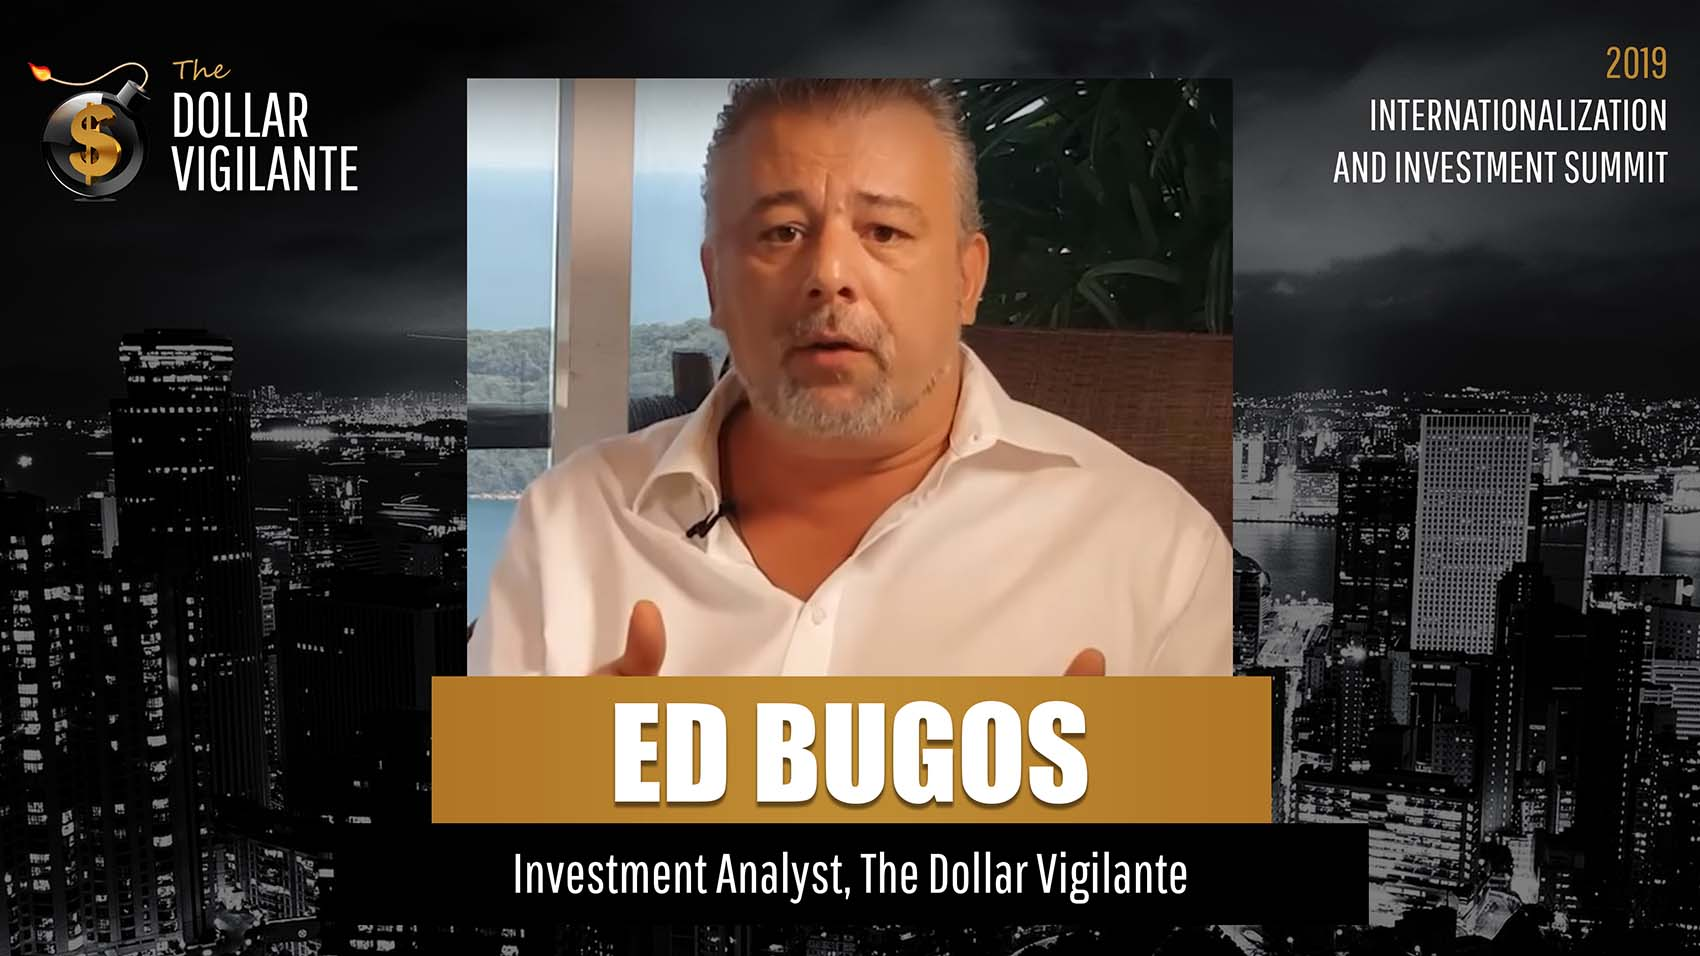 Ed Bugos 1700